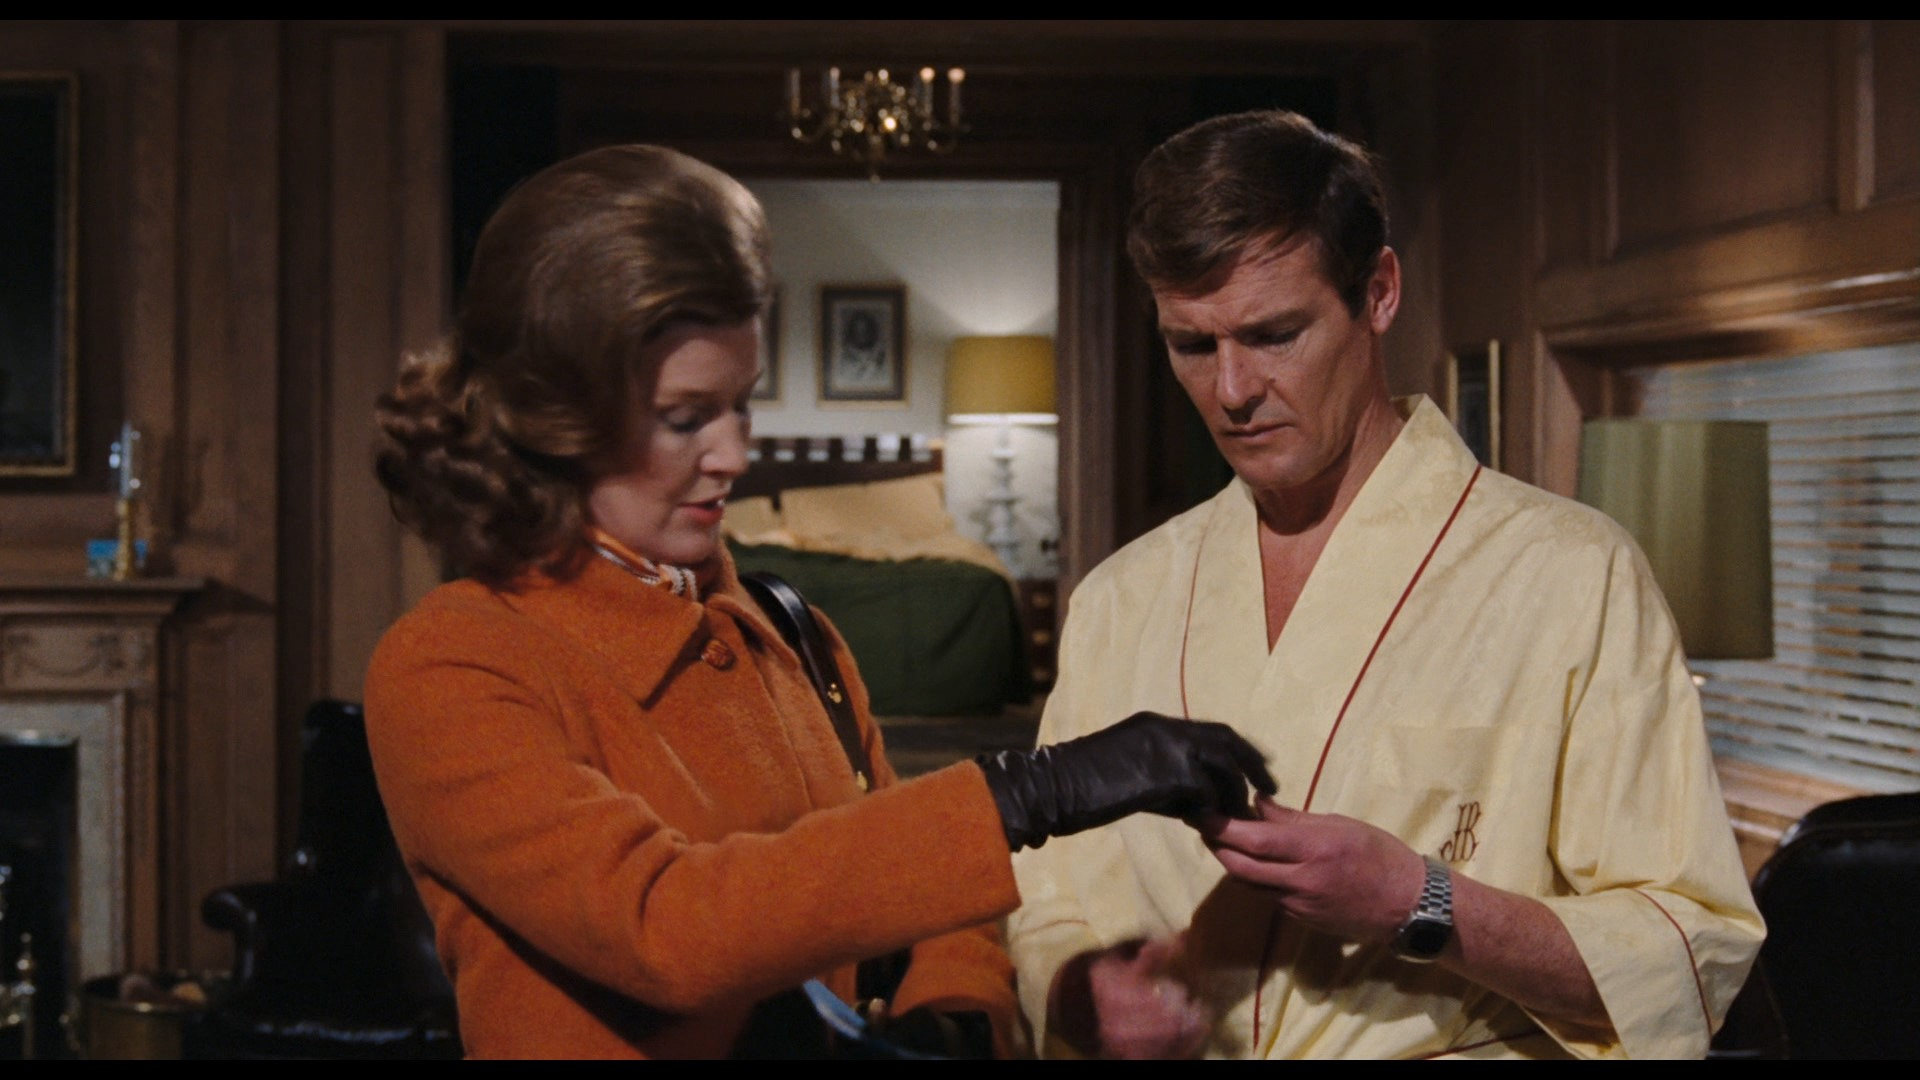 JAMES BOND: LIVE AND LET DIE (1973) - James Bond's (Roger Moore) Hamilton Pulsar Watch, On-set Photo - Image 11 of 13